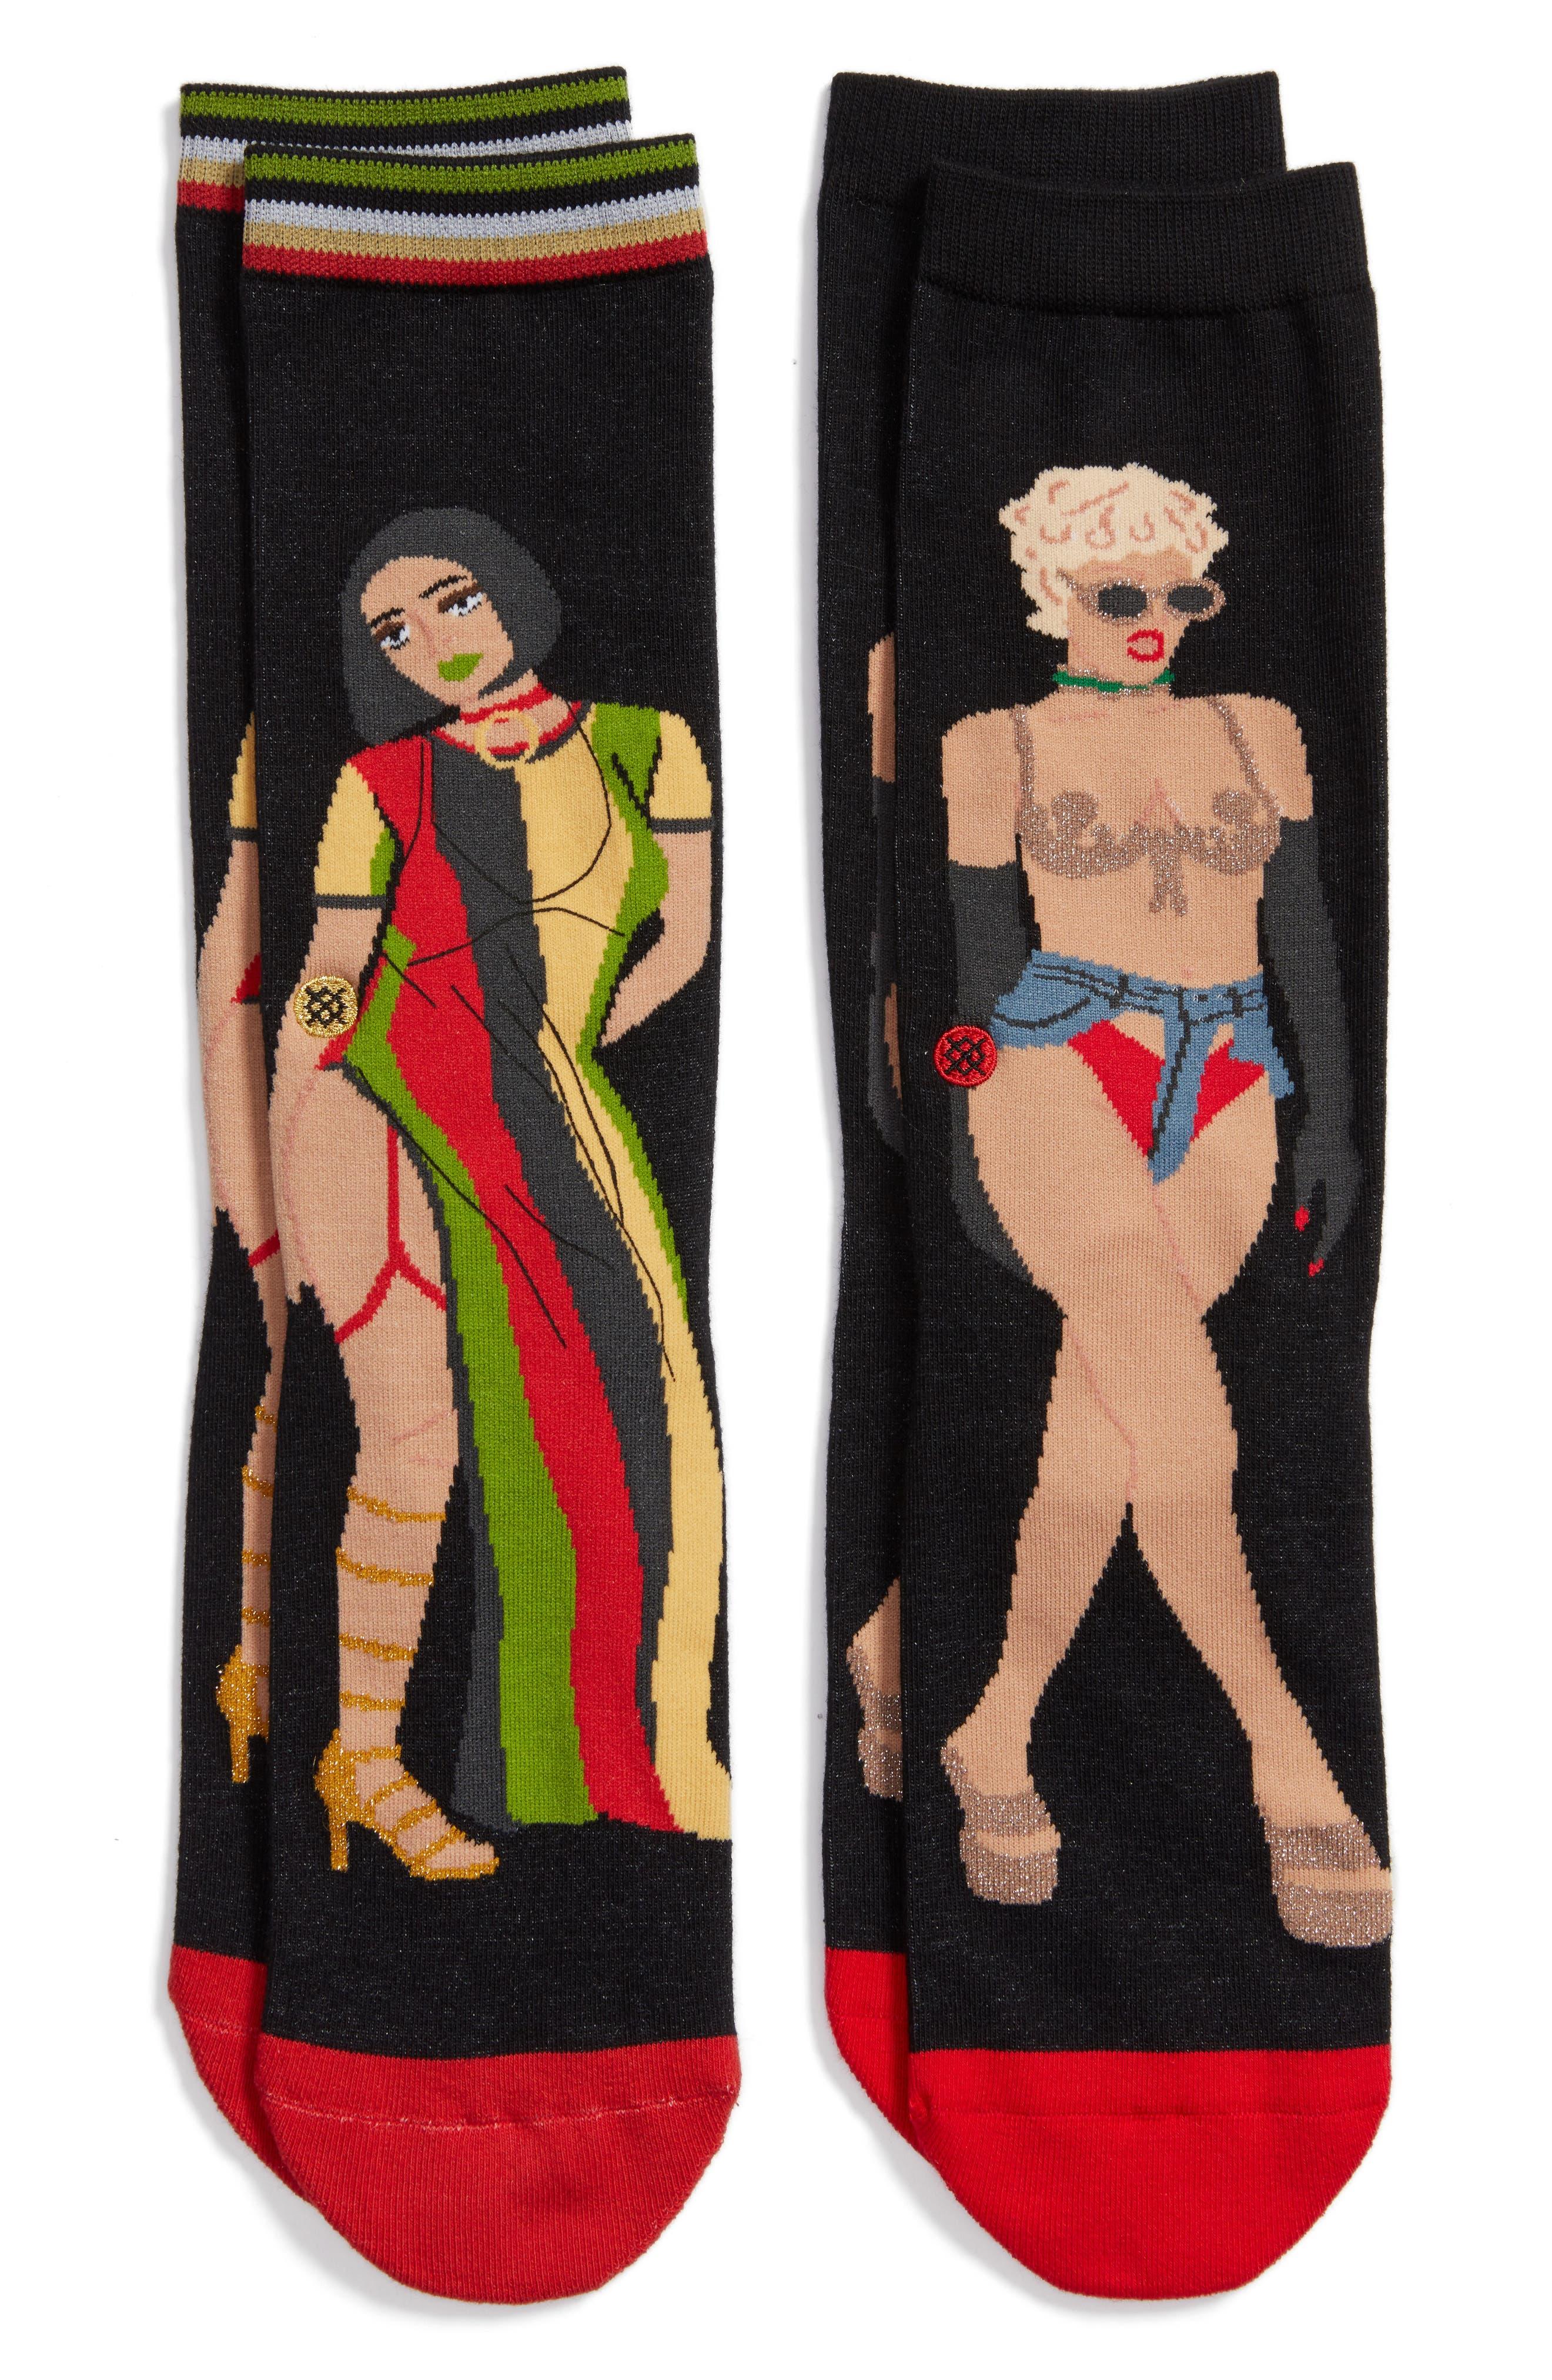 Main Image - Stance x Rihanna Music Video Crew Socks